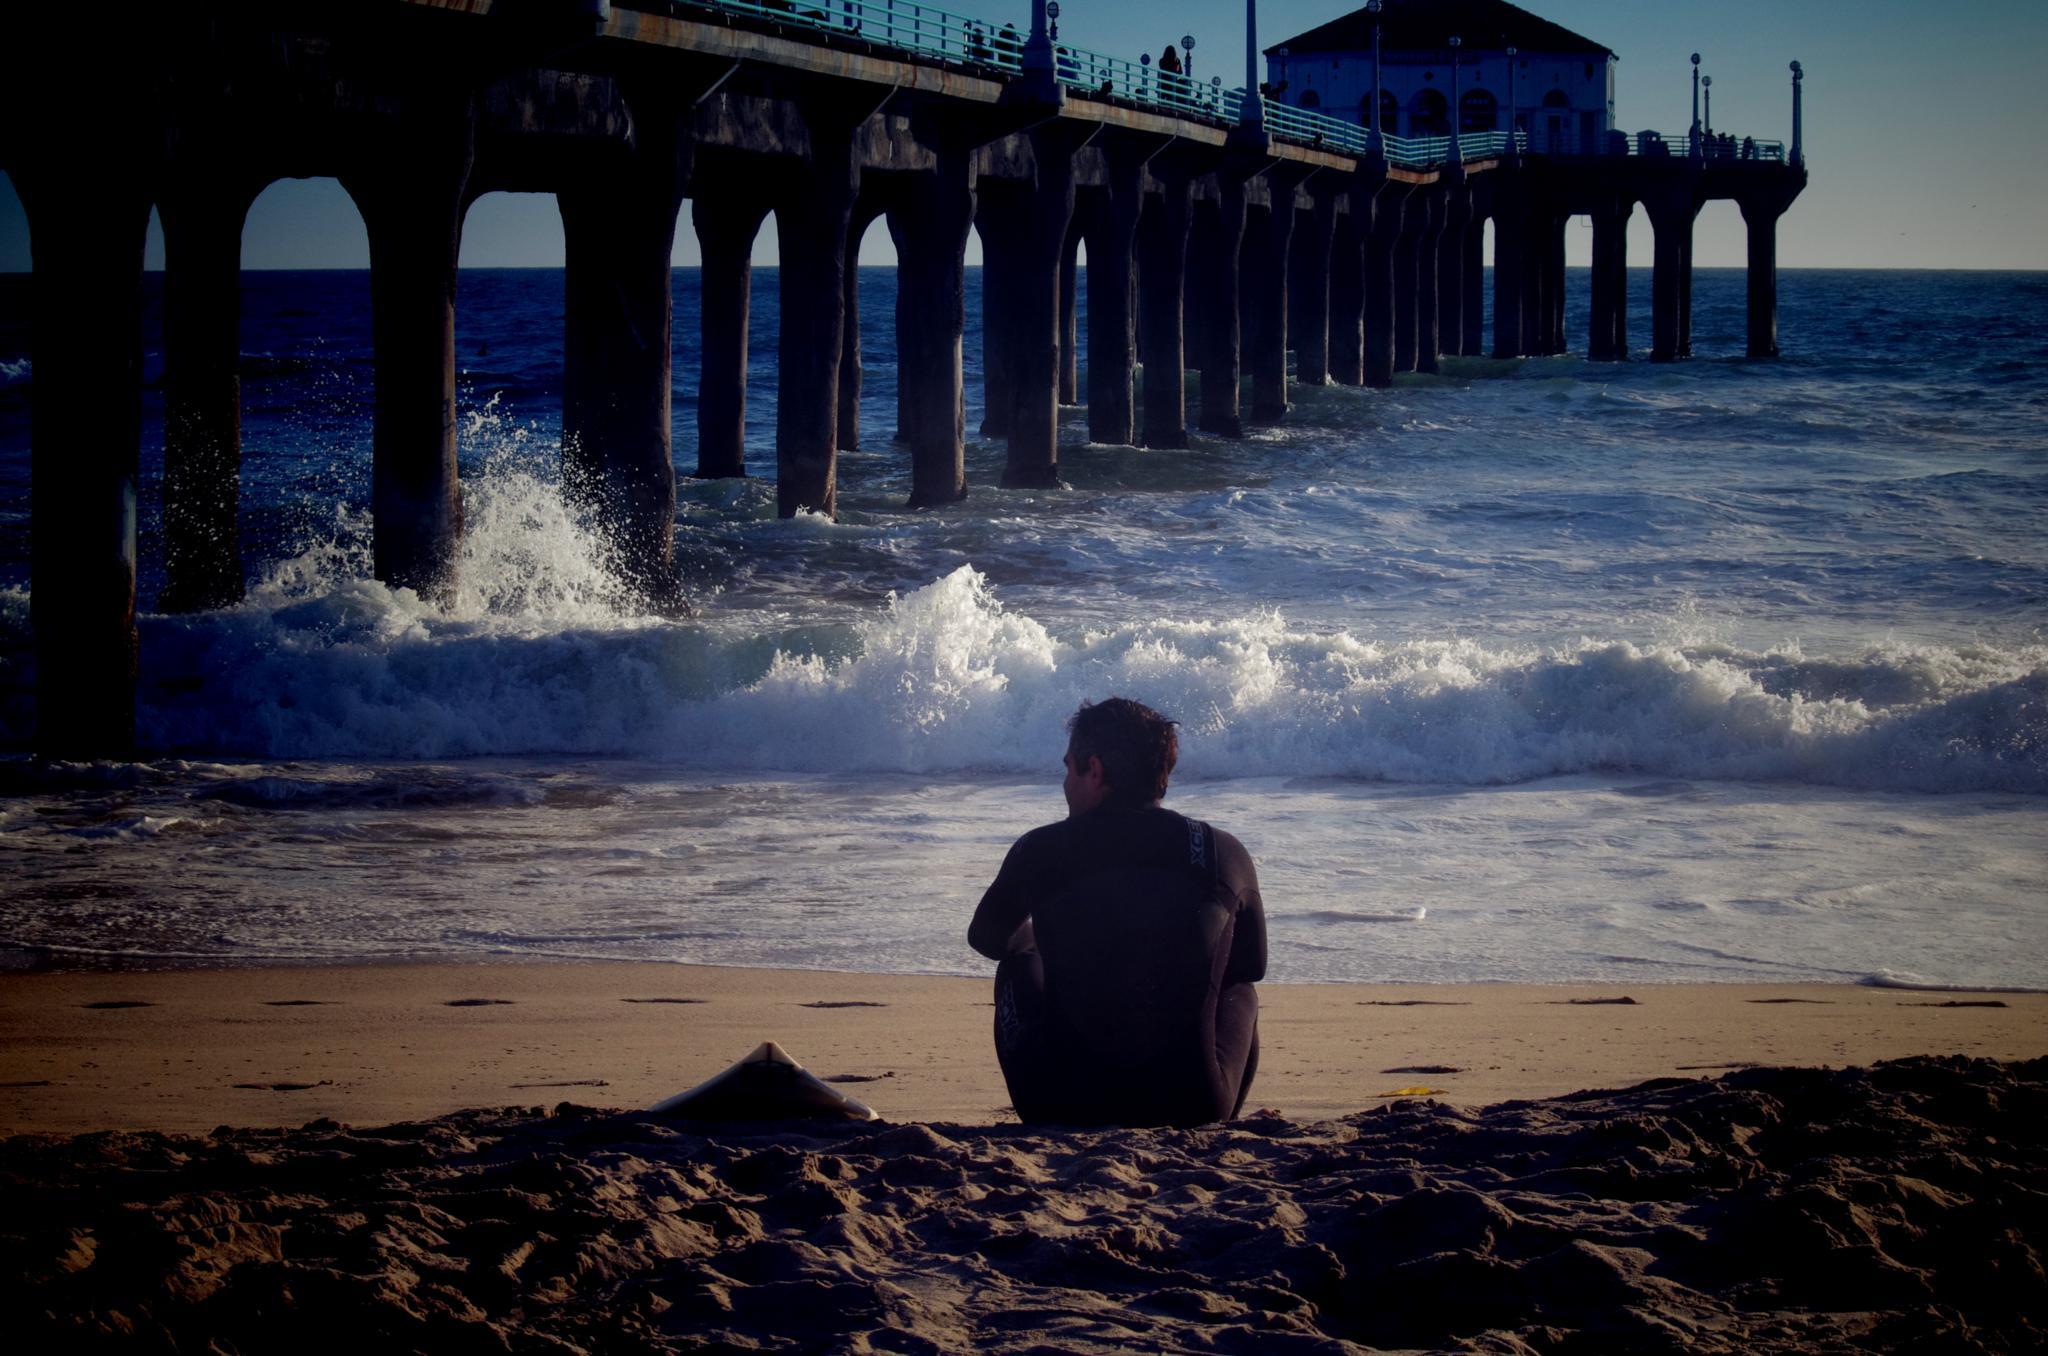 rest break by Garciathemexicansmith